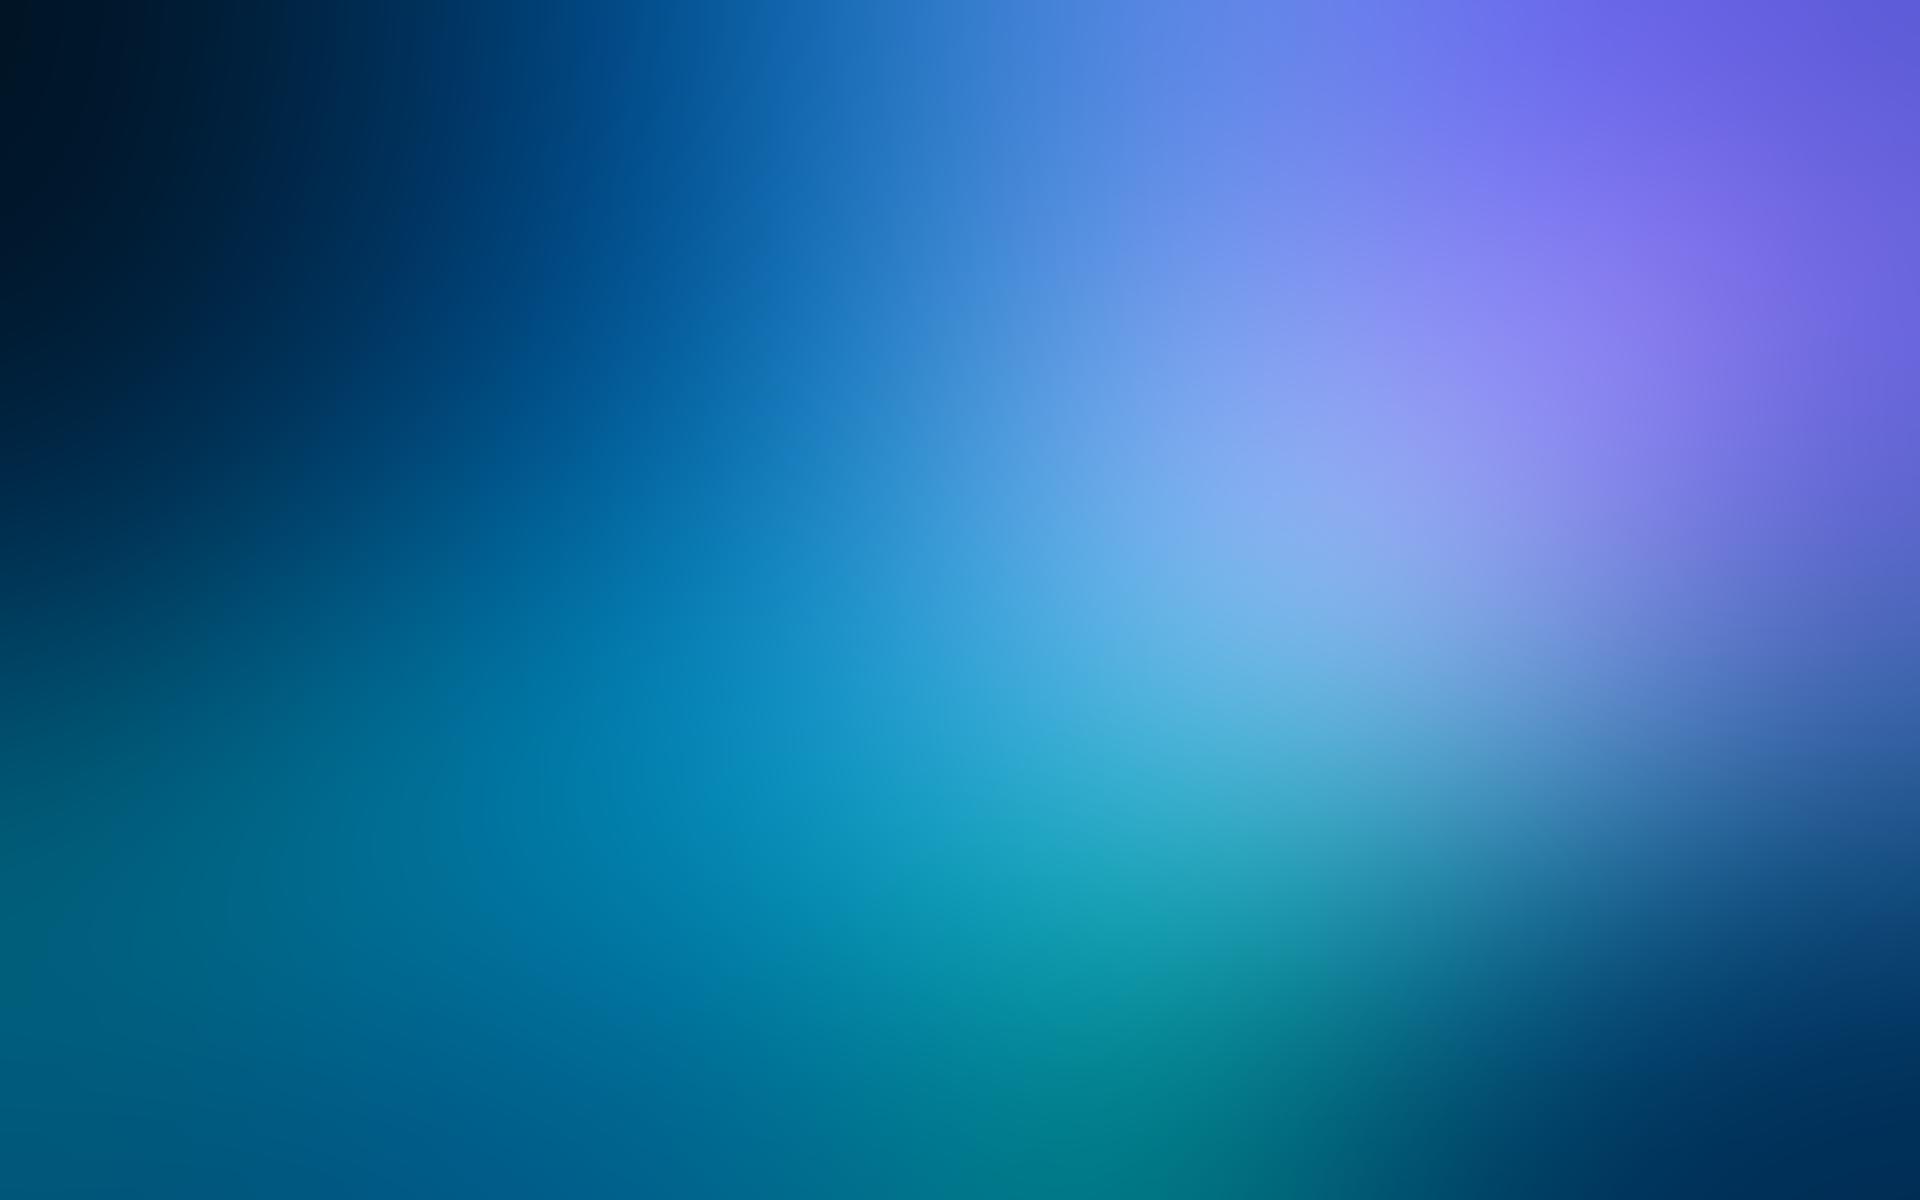 blue blur 2 wallpaper - photo #24